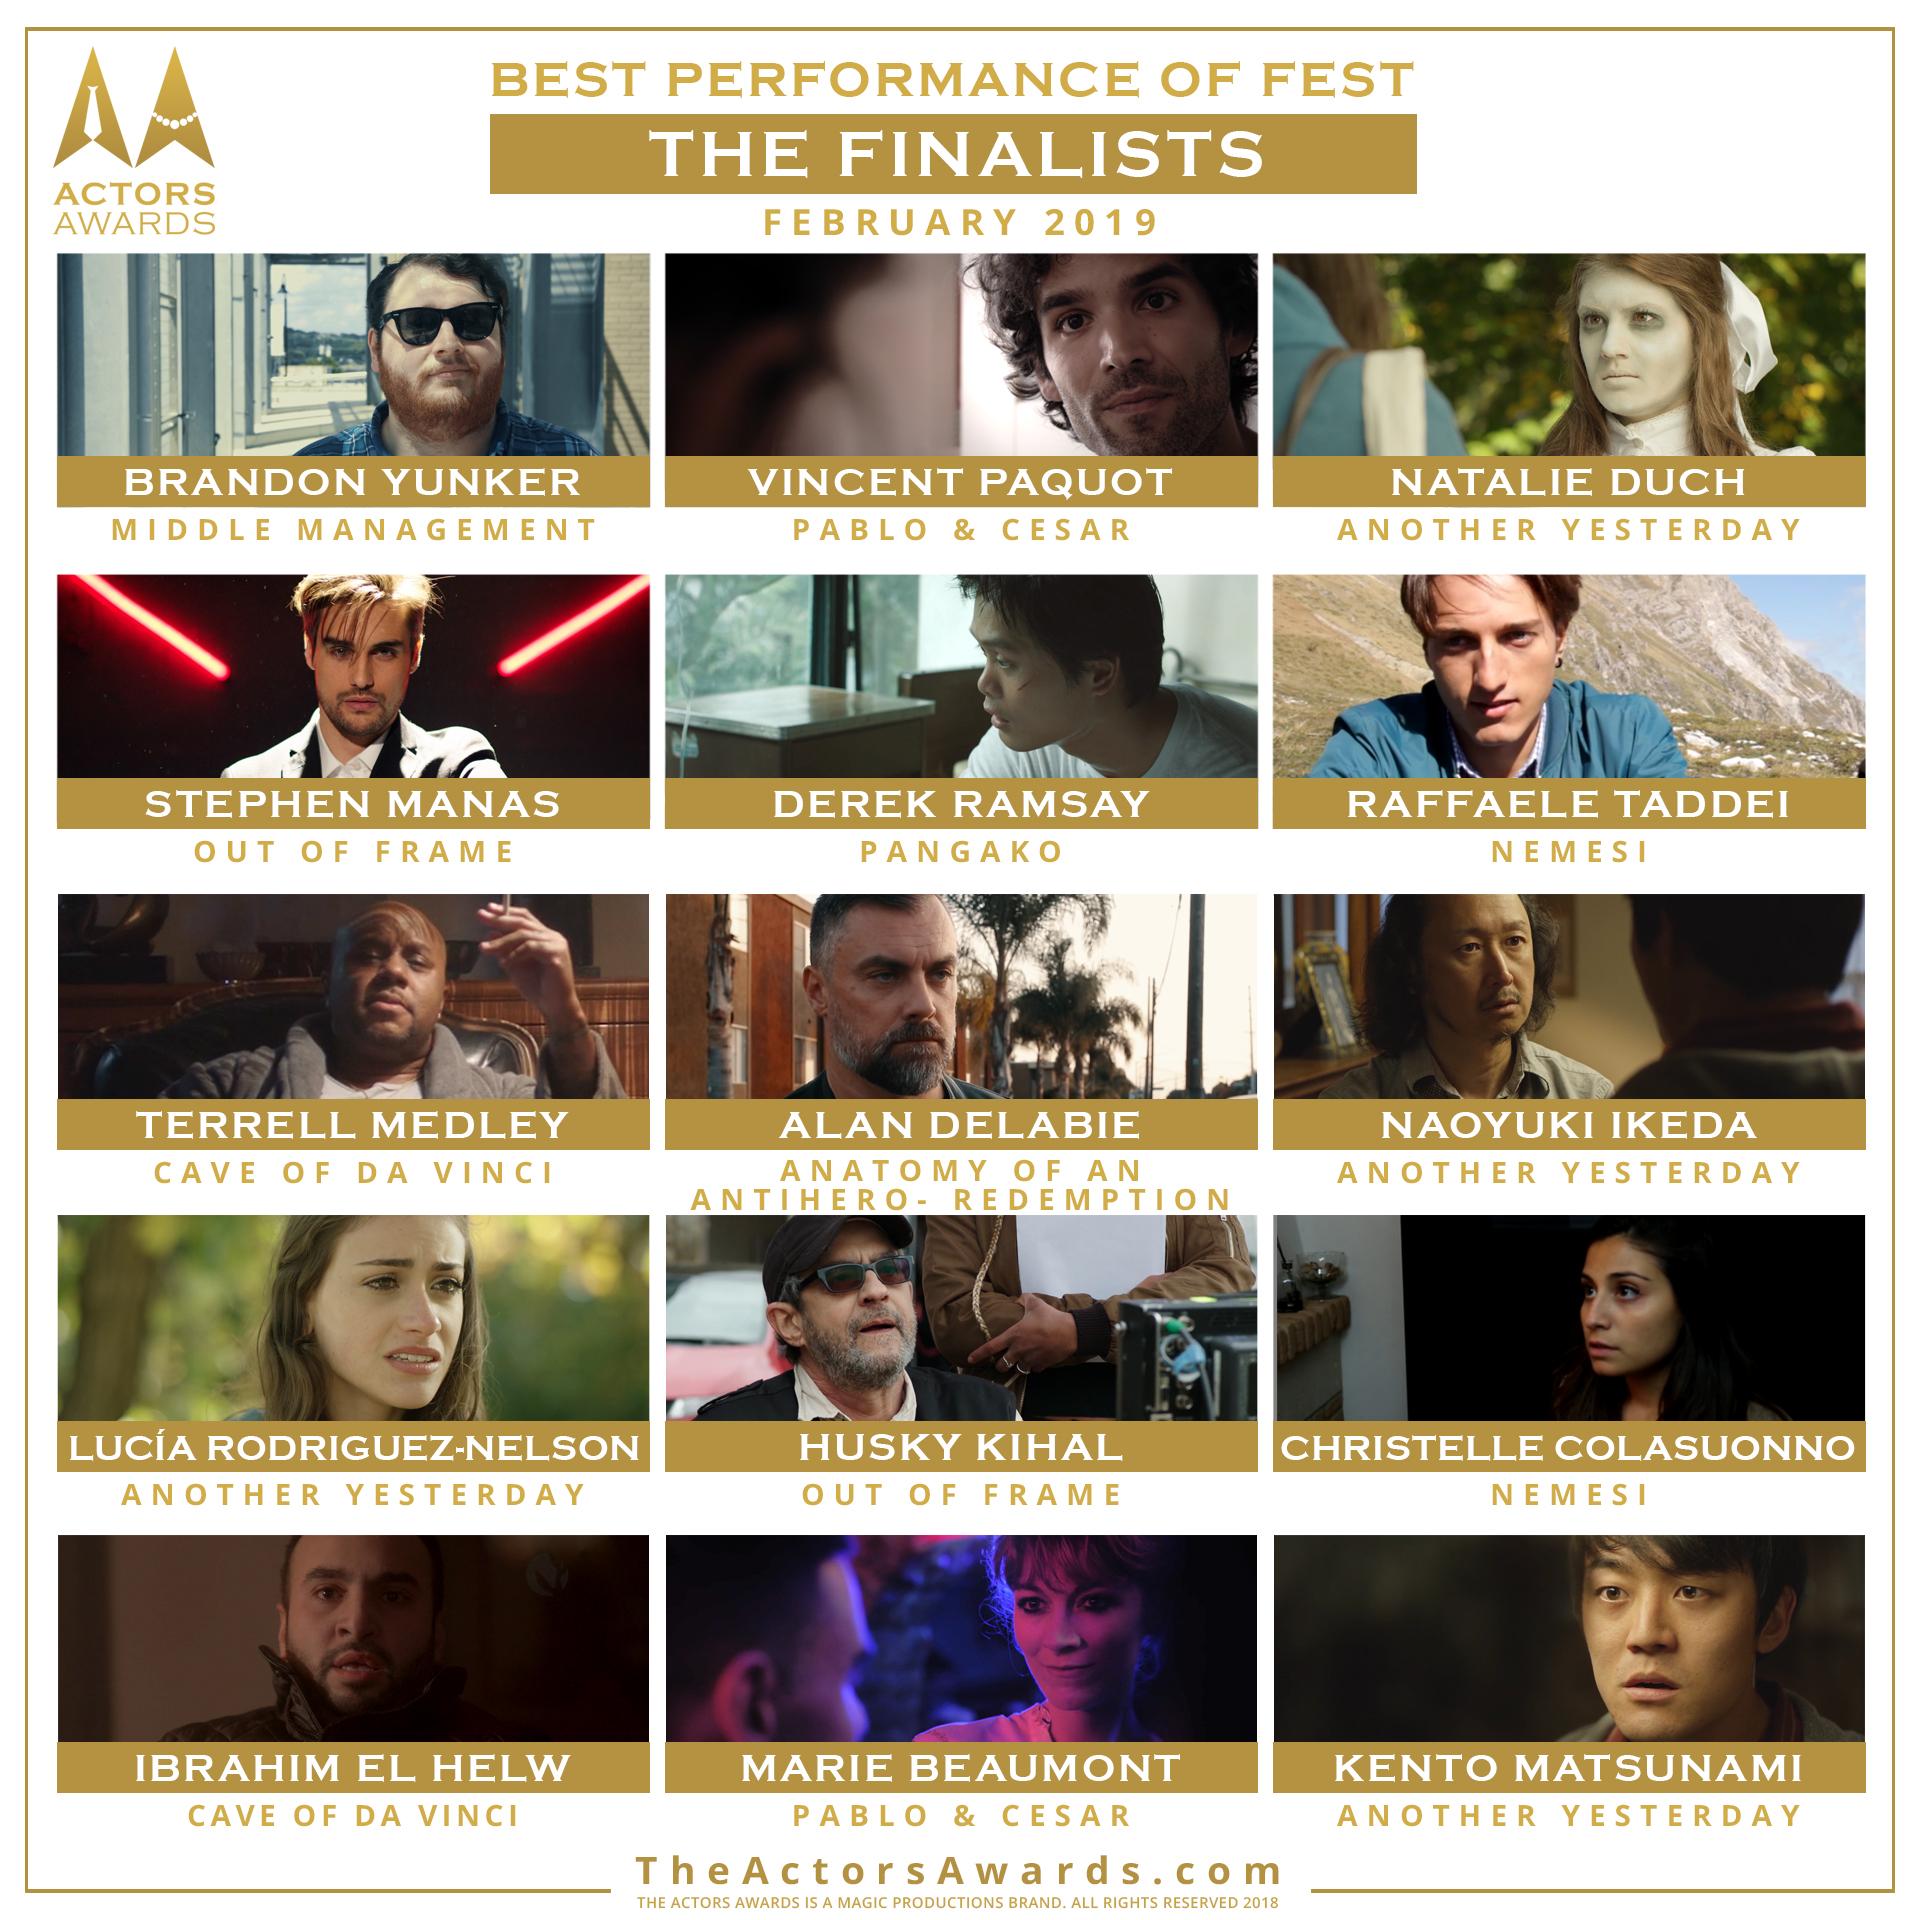 2019 02 finalists